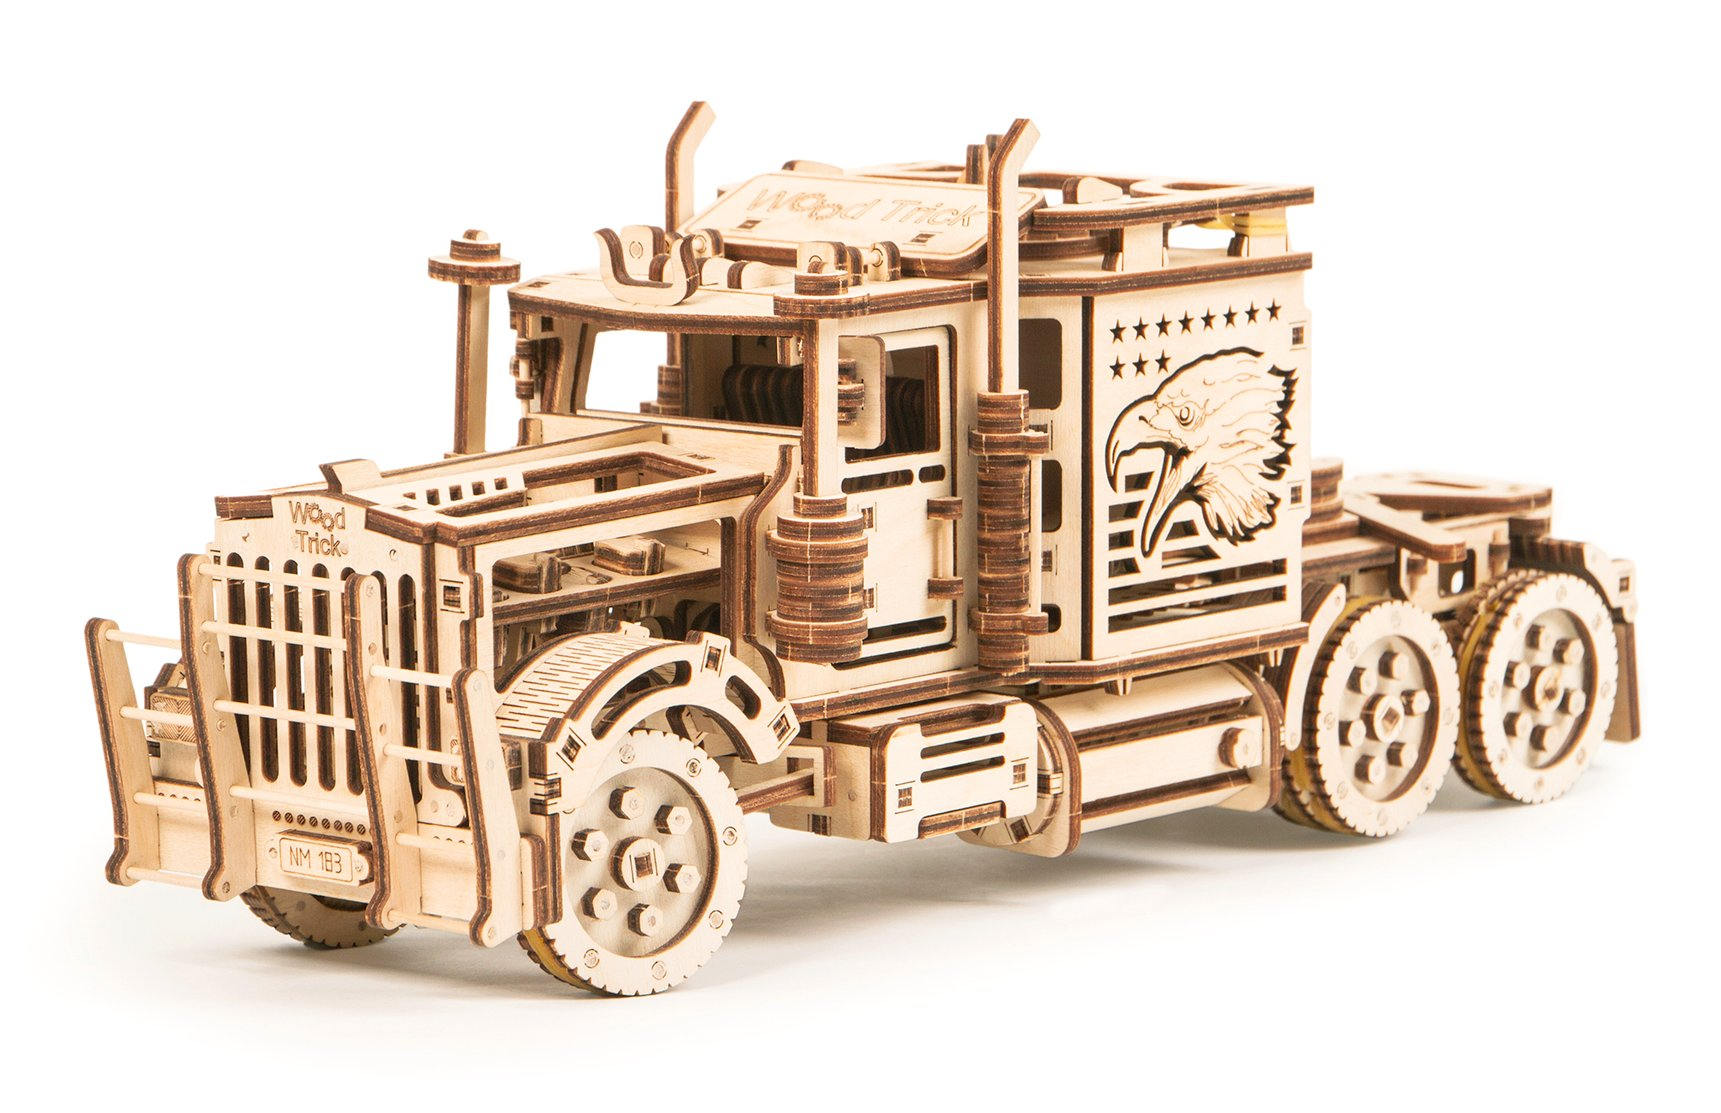 WOOD TRICK Big Rig Truck (LKW-Zugmaschine), 485 Bauteile